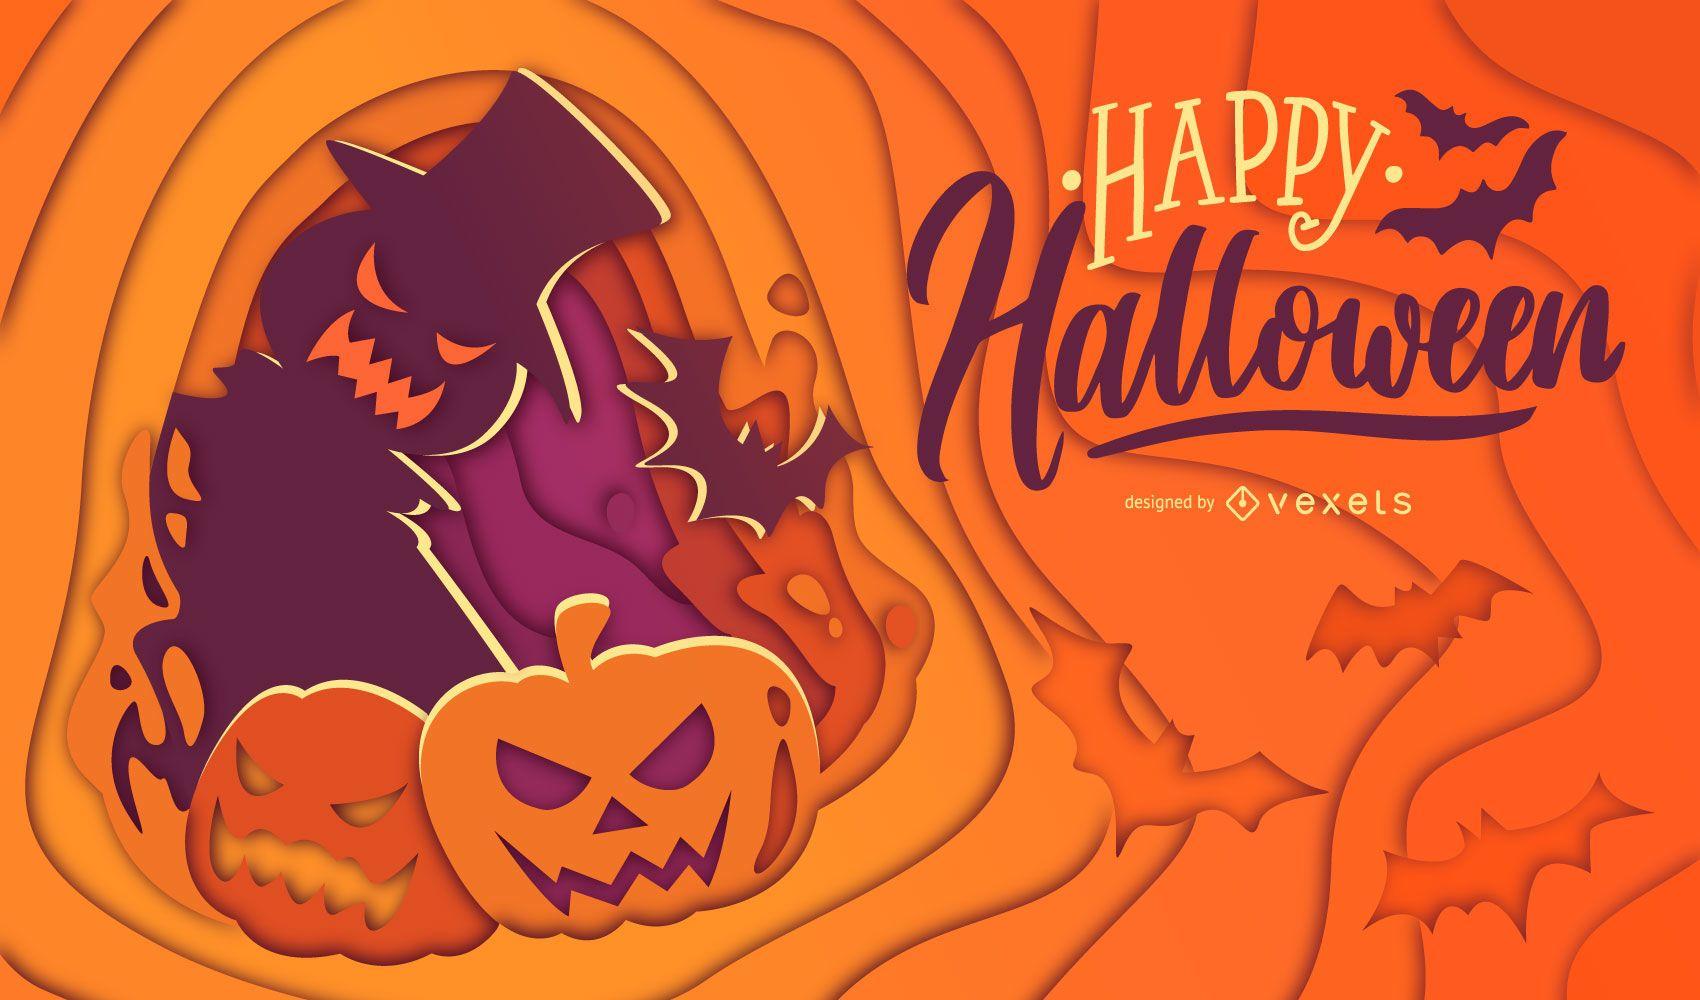 Halloween pumpkin papercut illustration